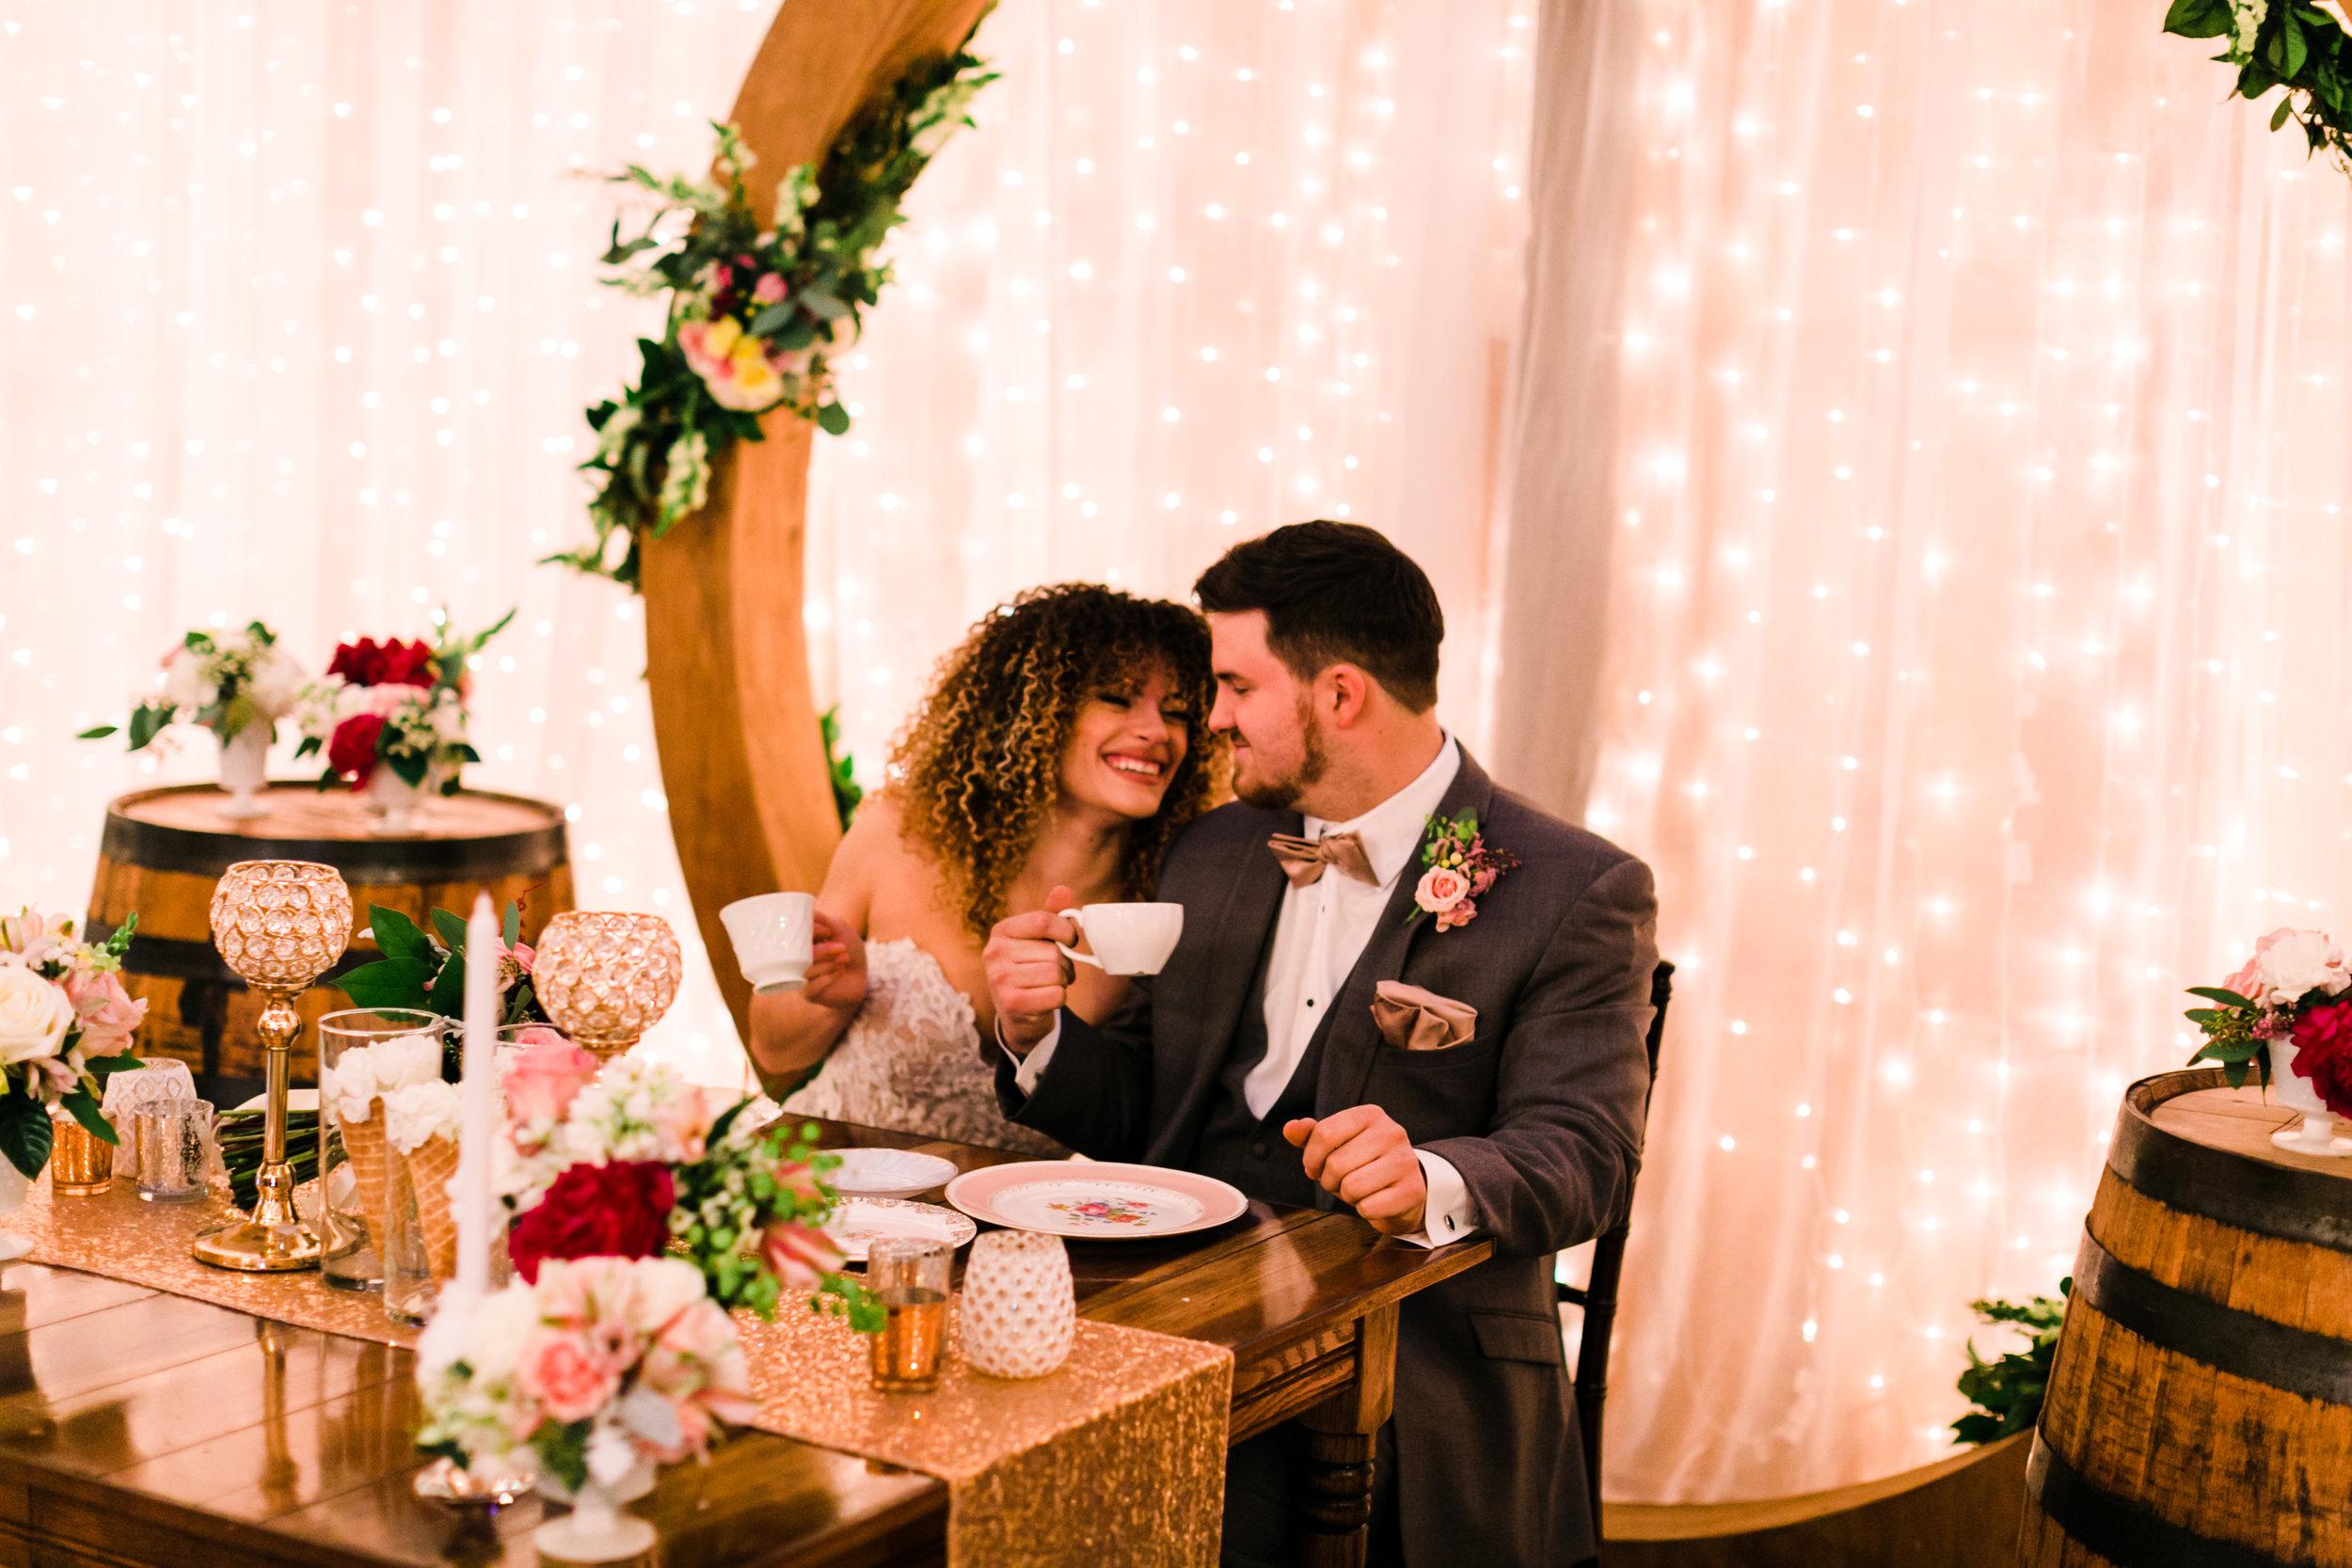 romantic+valentines+day+wedding (15 of 21).jpg